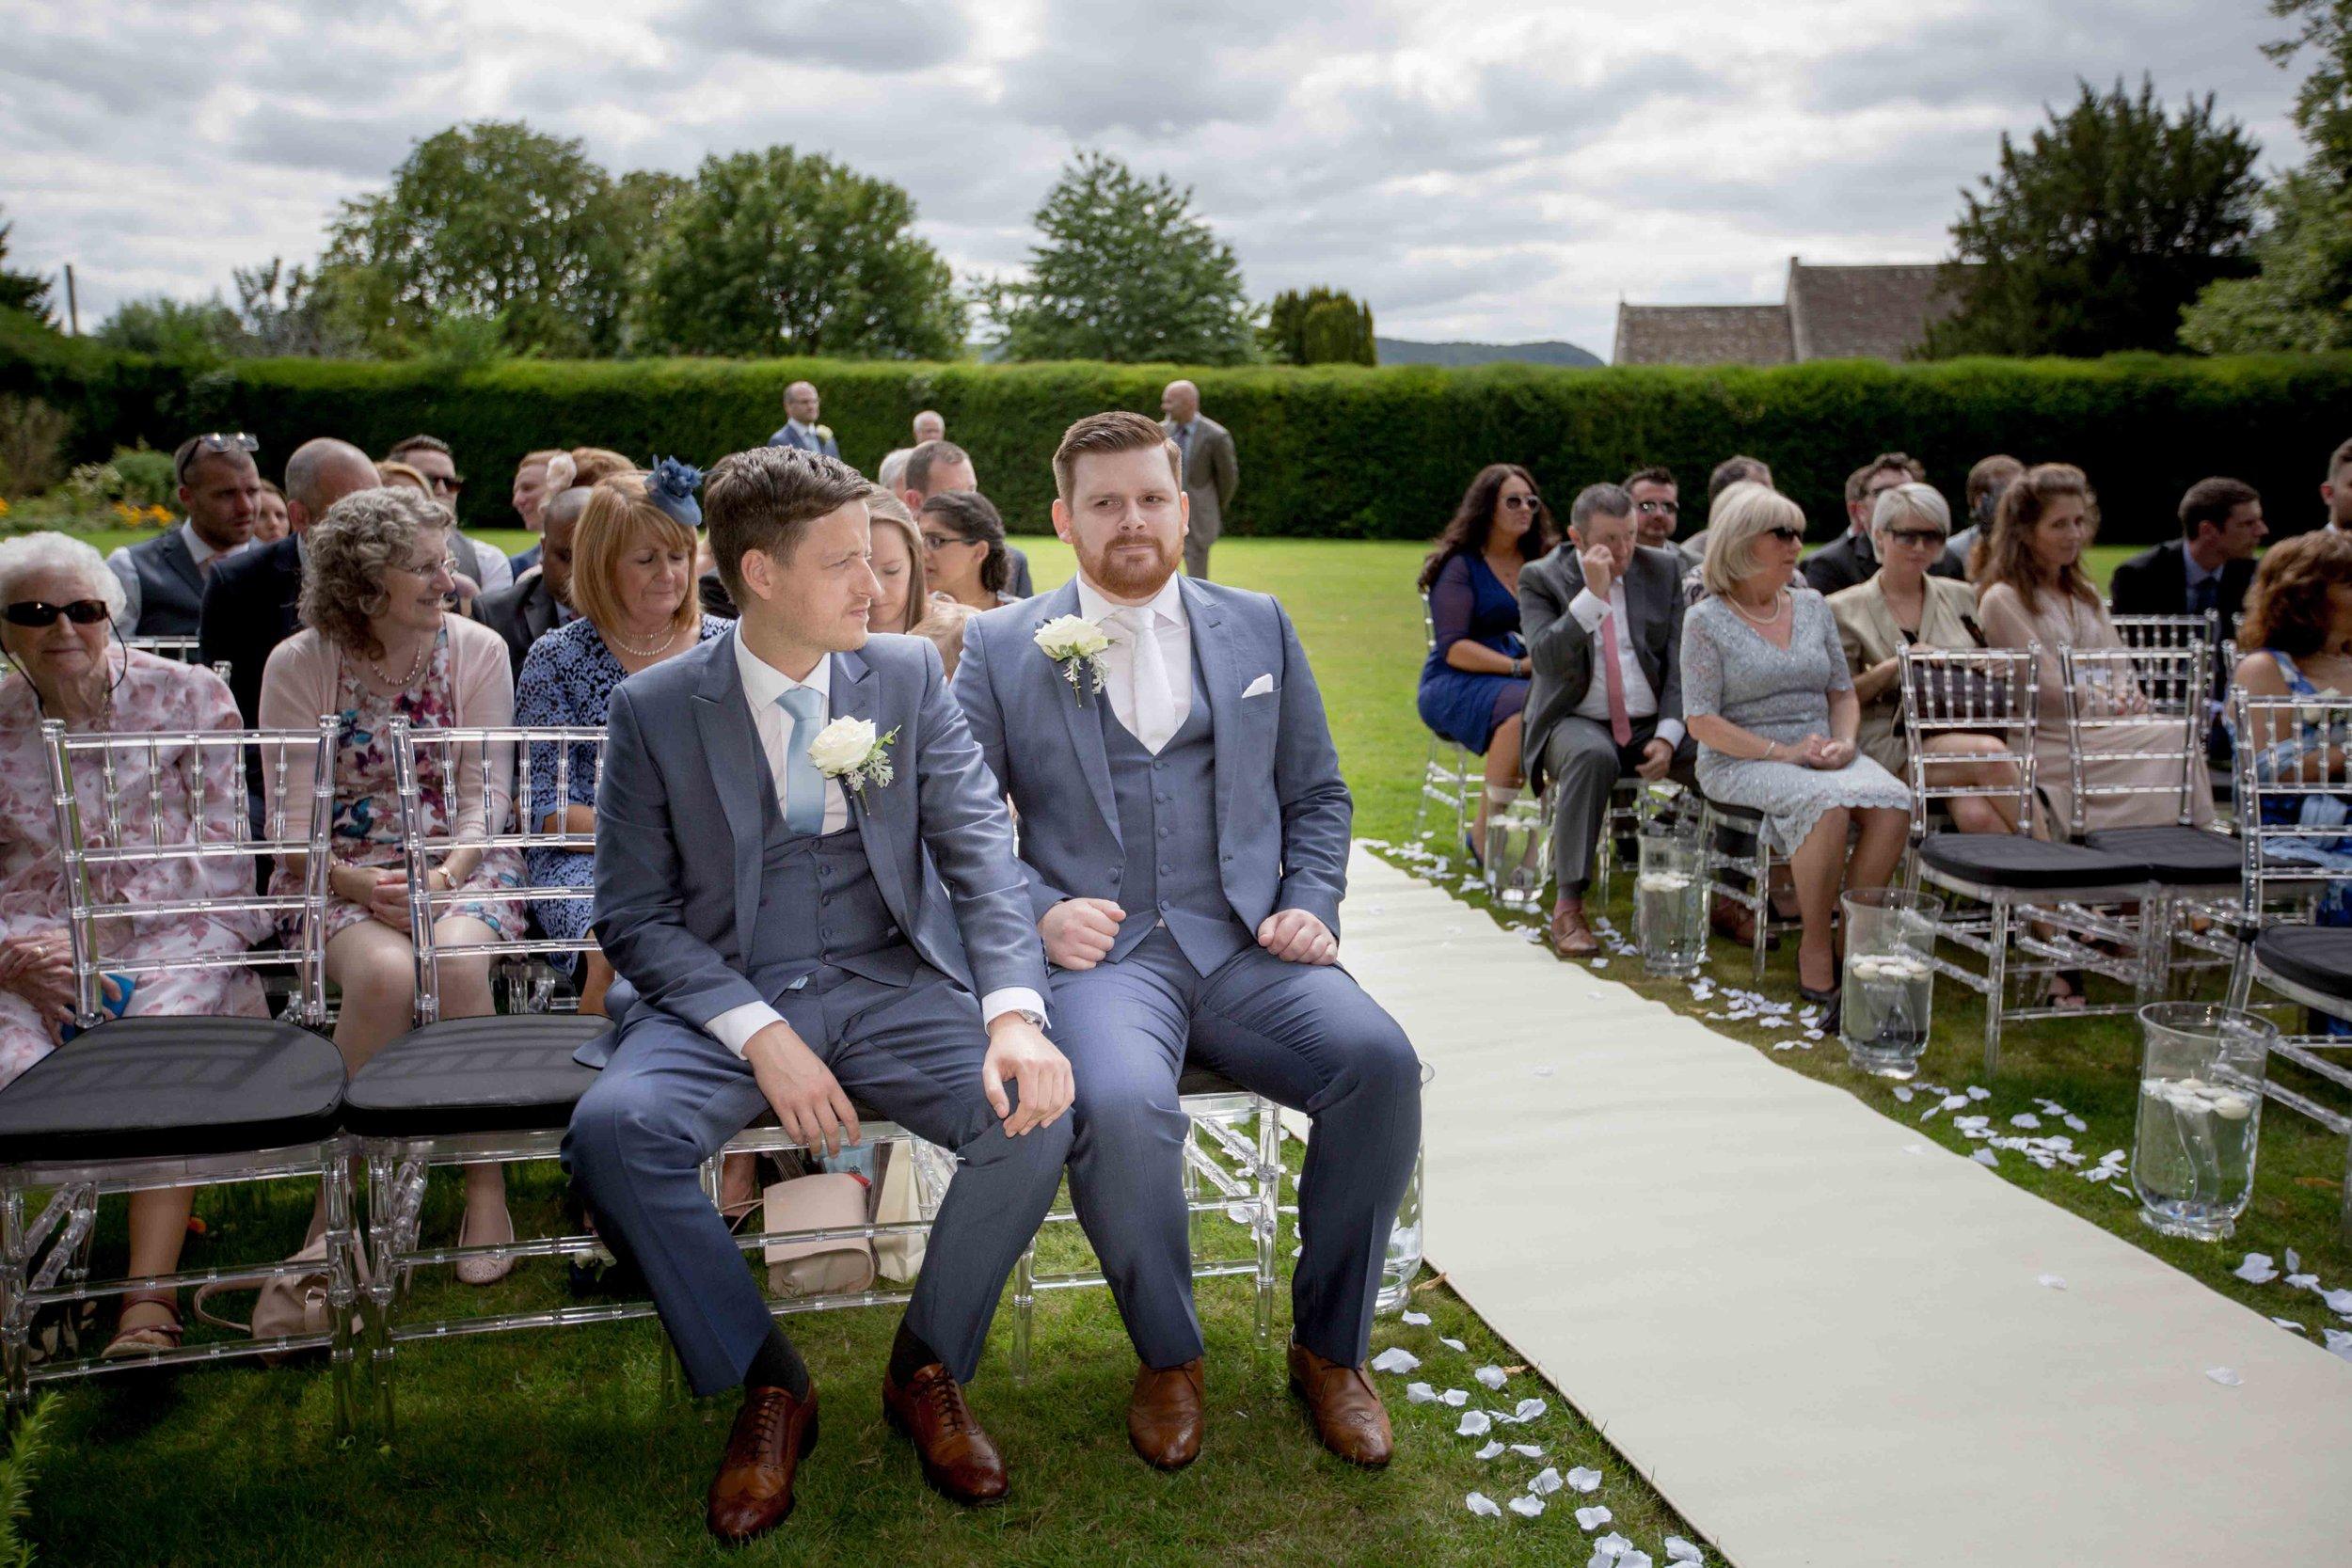 cotswold-wedding-photography-at-stonehouse-court-hotel-natalia-smith-photography-gloucestershire-wedding-photographer-26.jpg